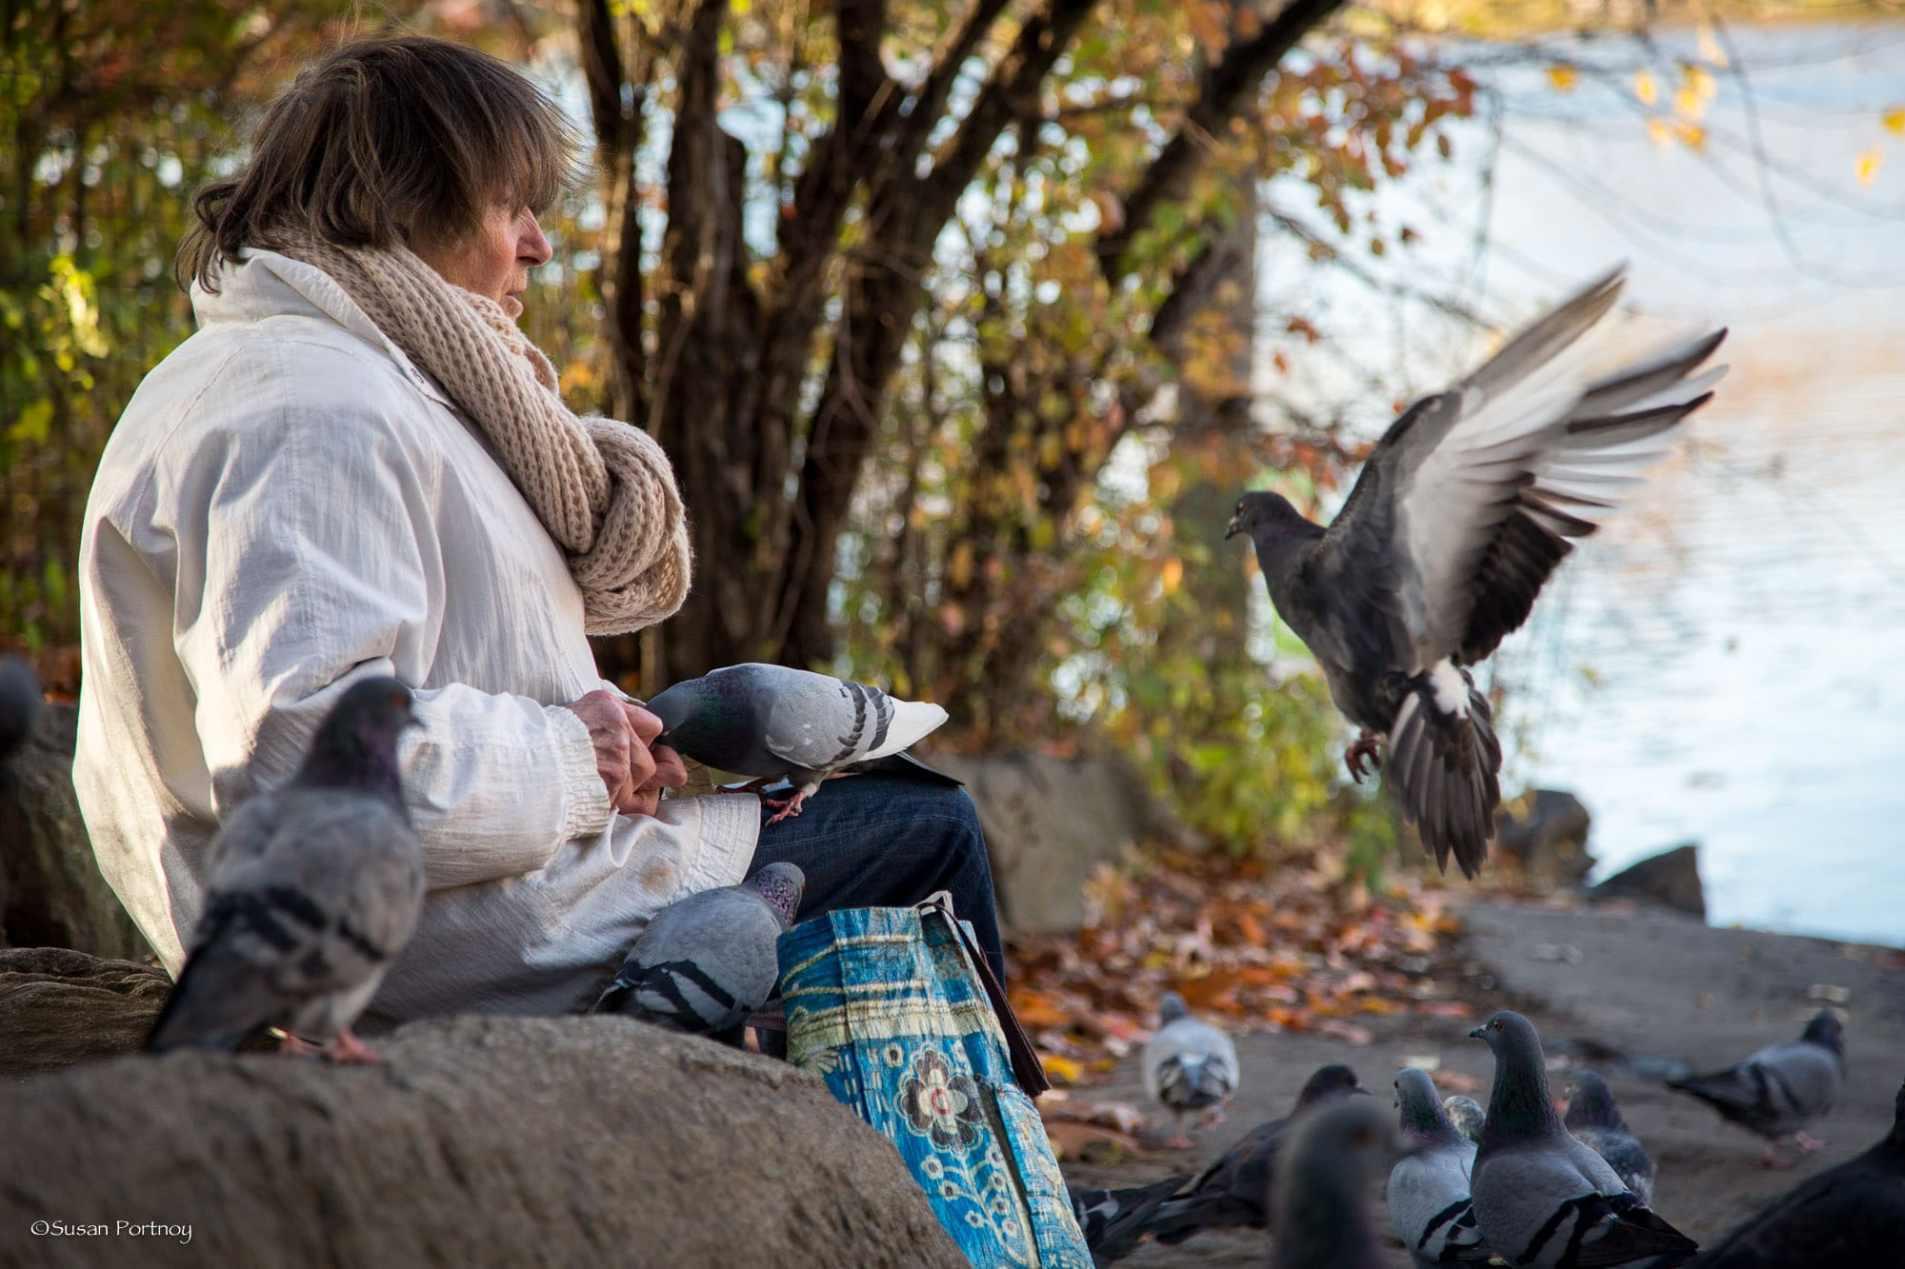 Lillian Bobo feeds pigeons in Central Park